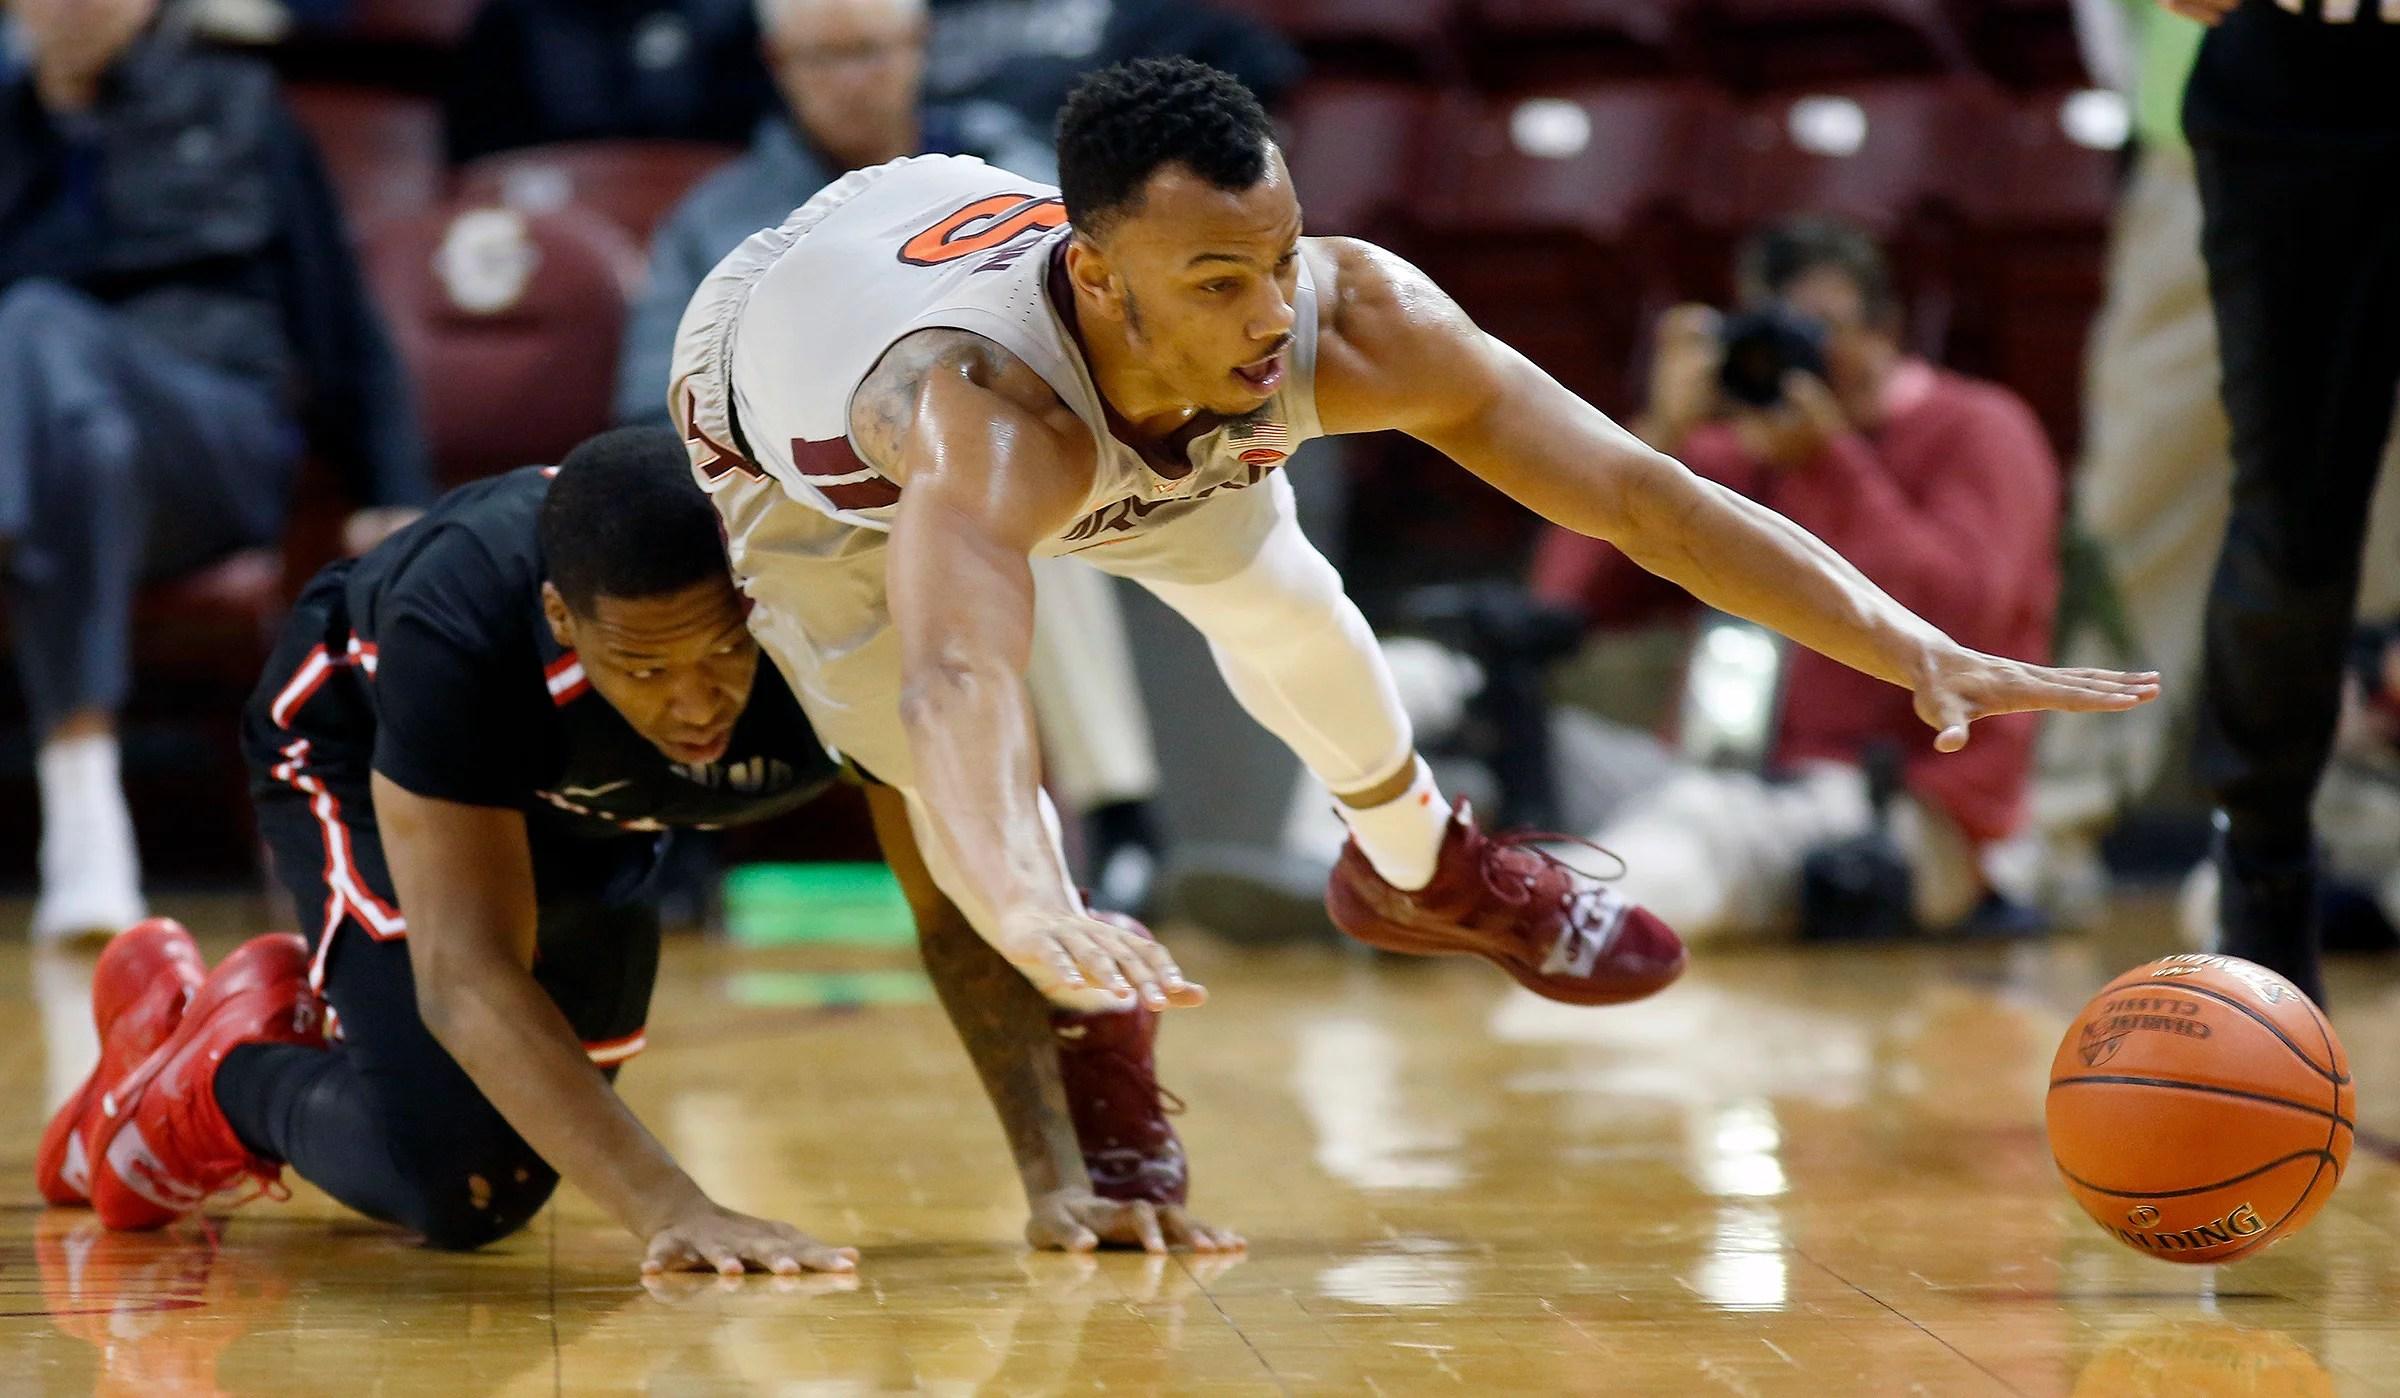 Virginia Tech Ball State Basketball_1542328907782